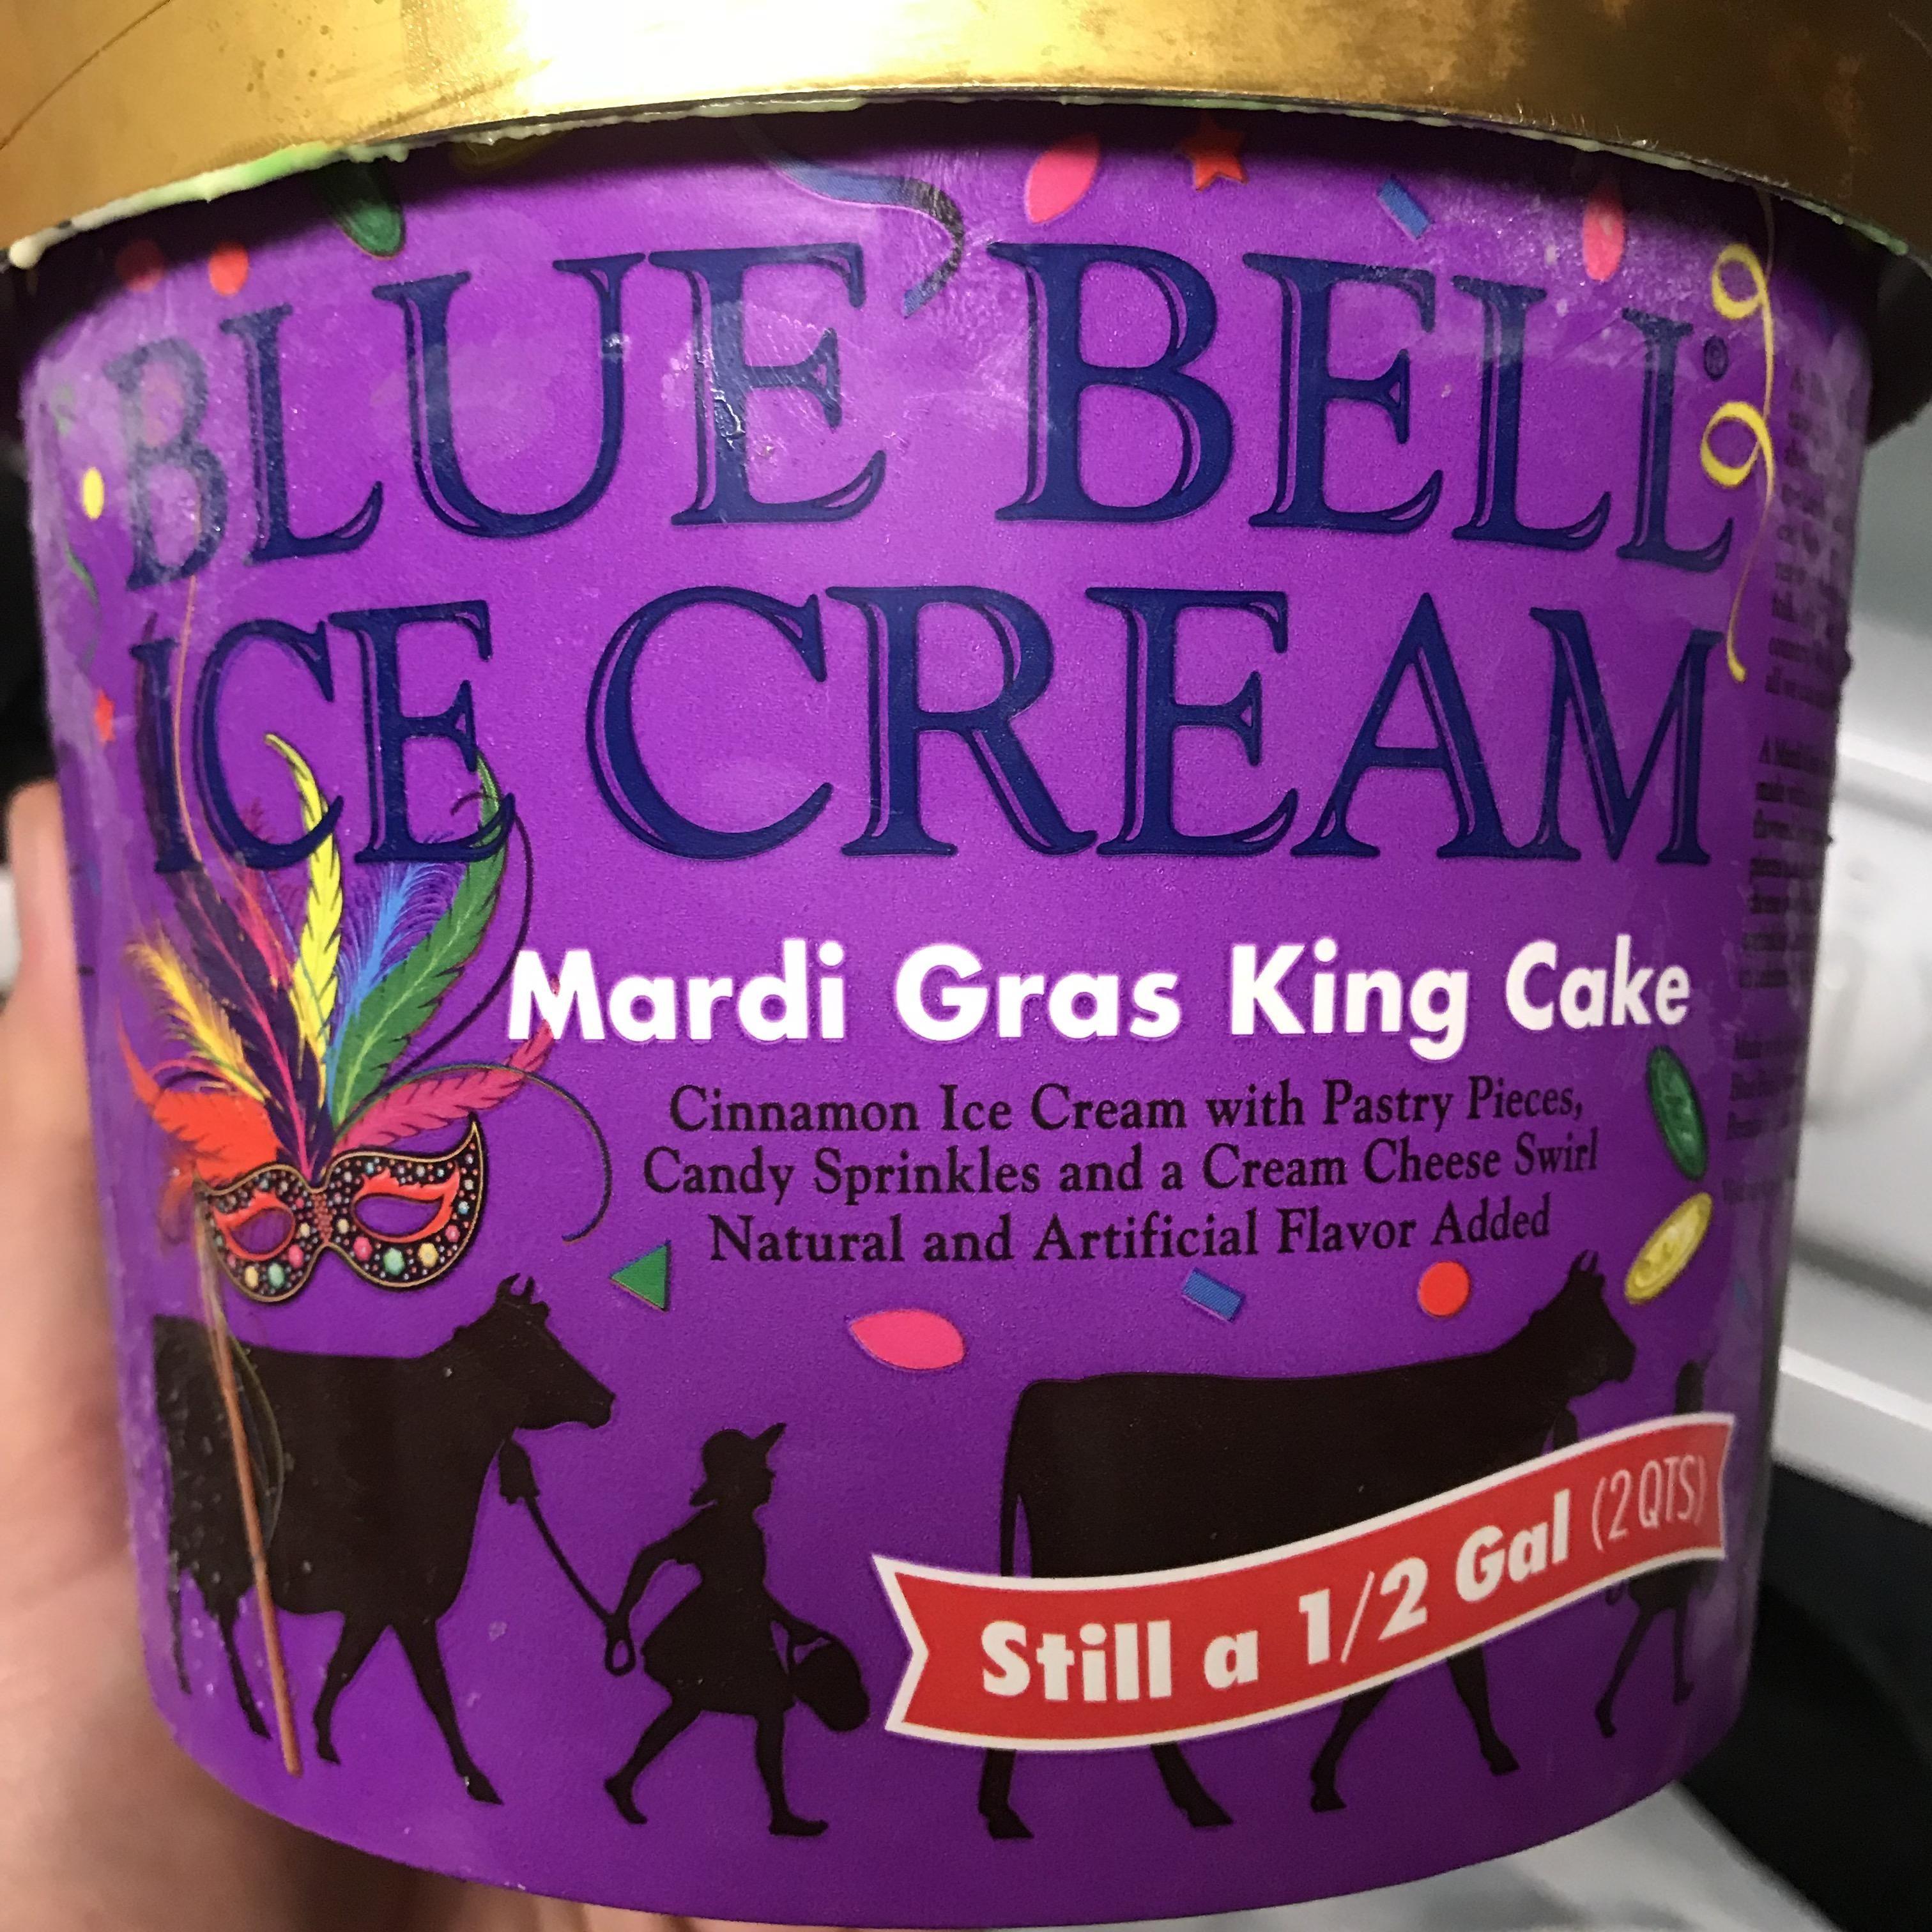 Blue bell makes seasonal mardi gras themed ice cream